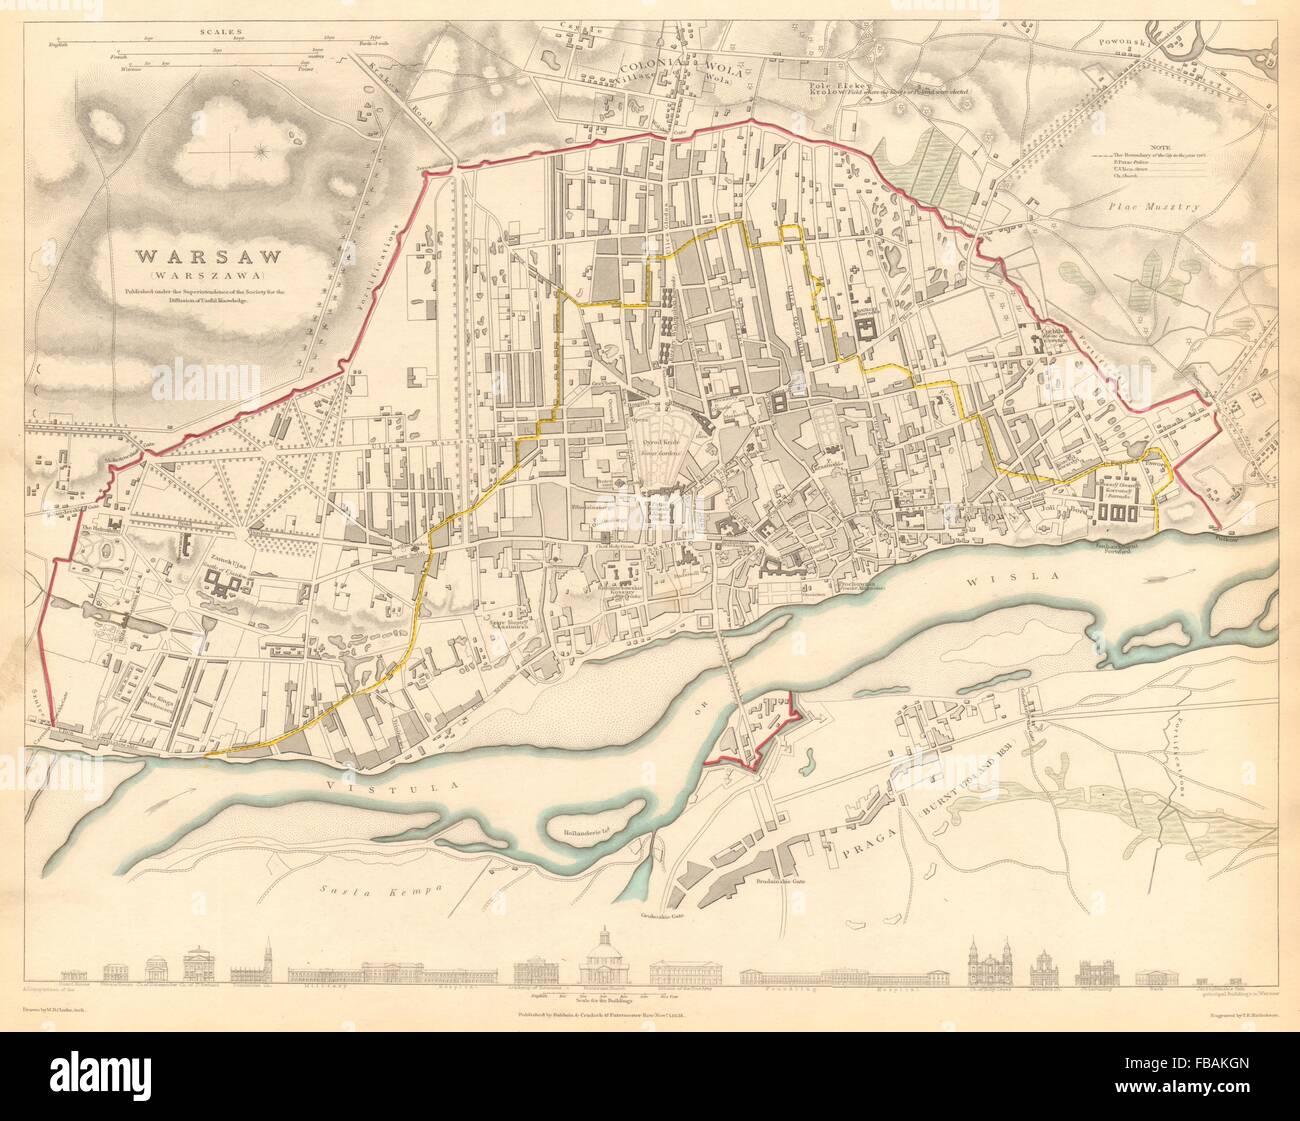 WARSAW WARSZAWA. Antique town city map plan. Building profiles.Colour.SDUK 1844 Stock Photo